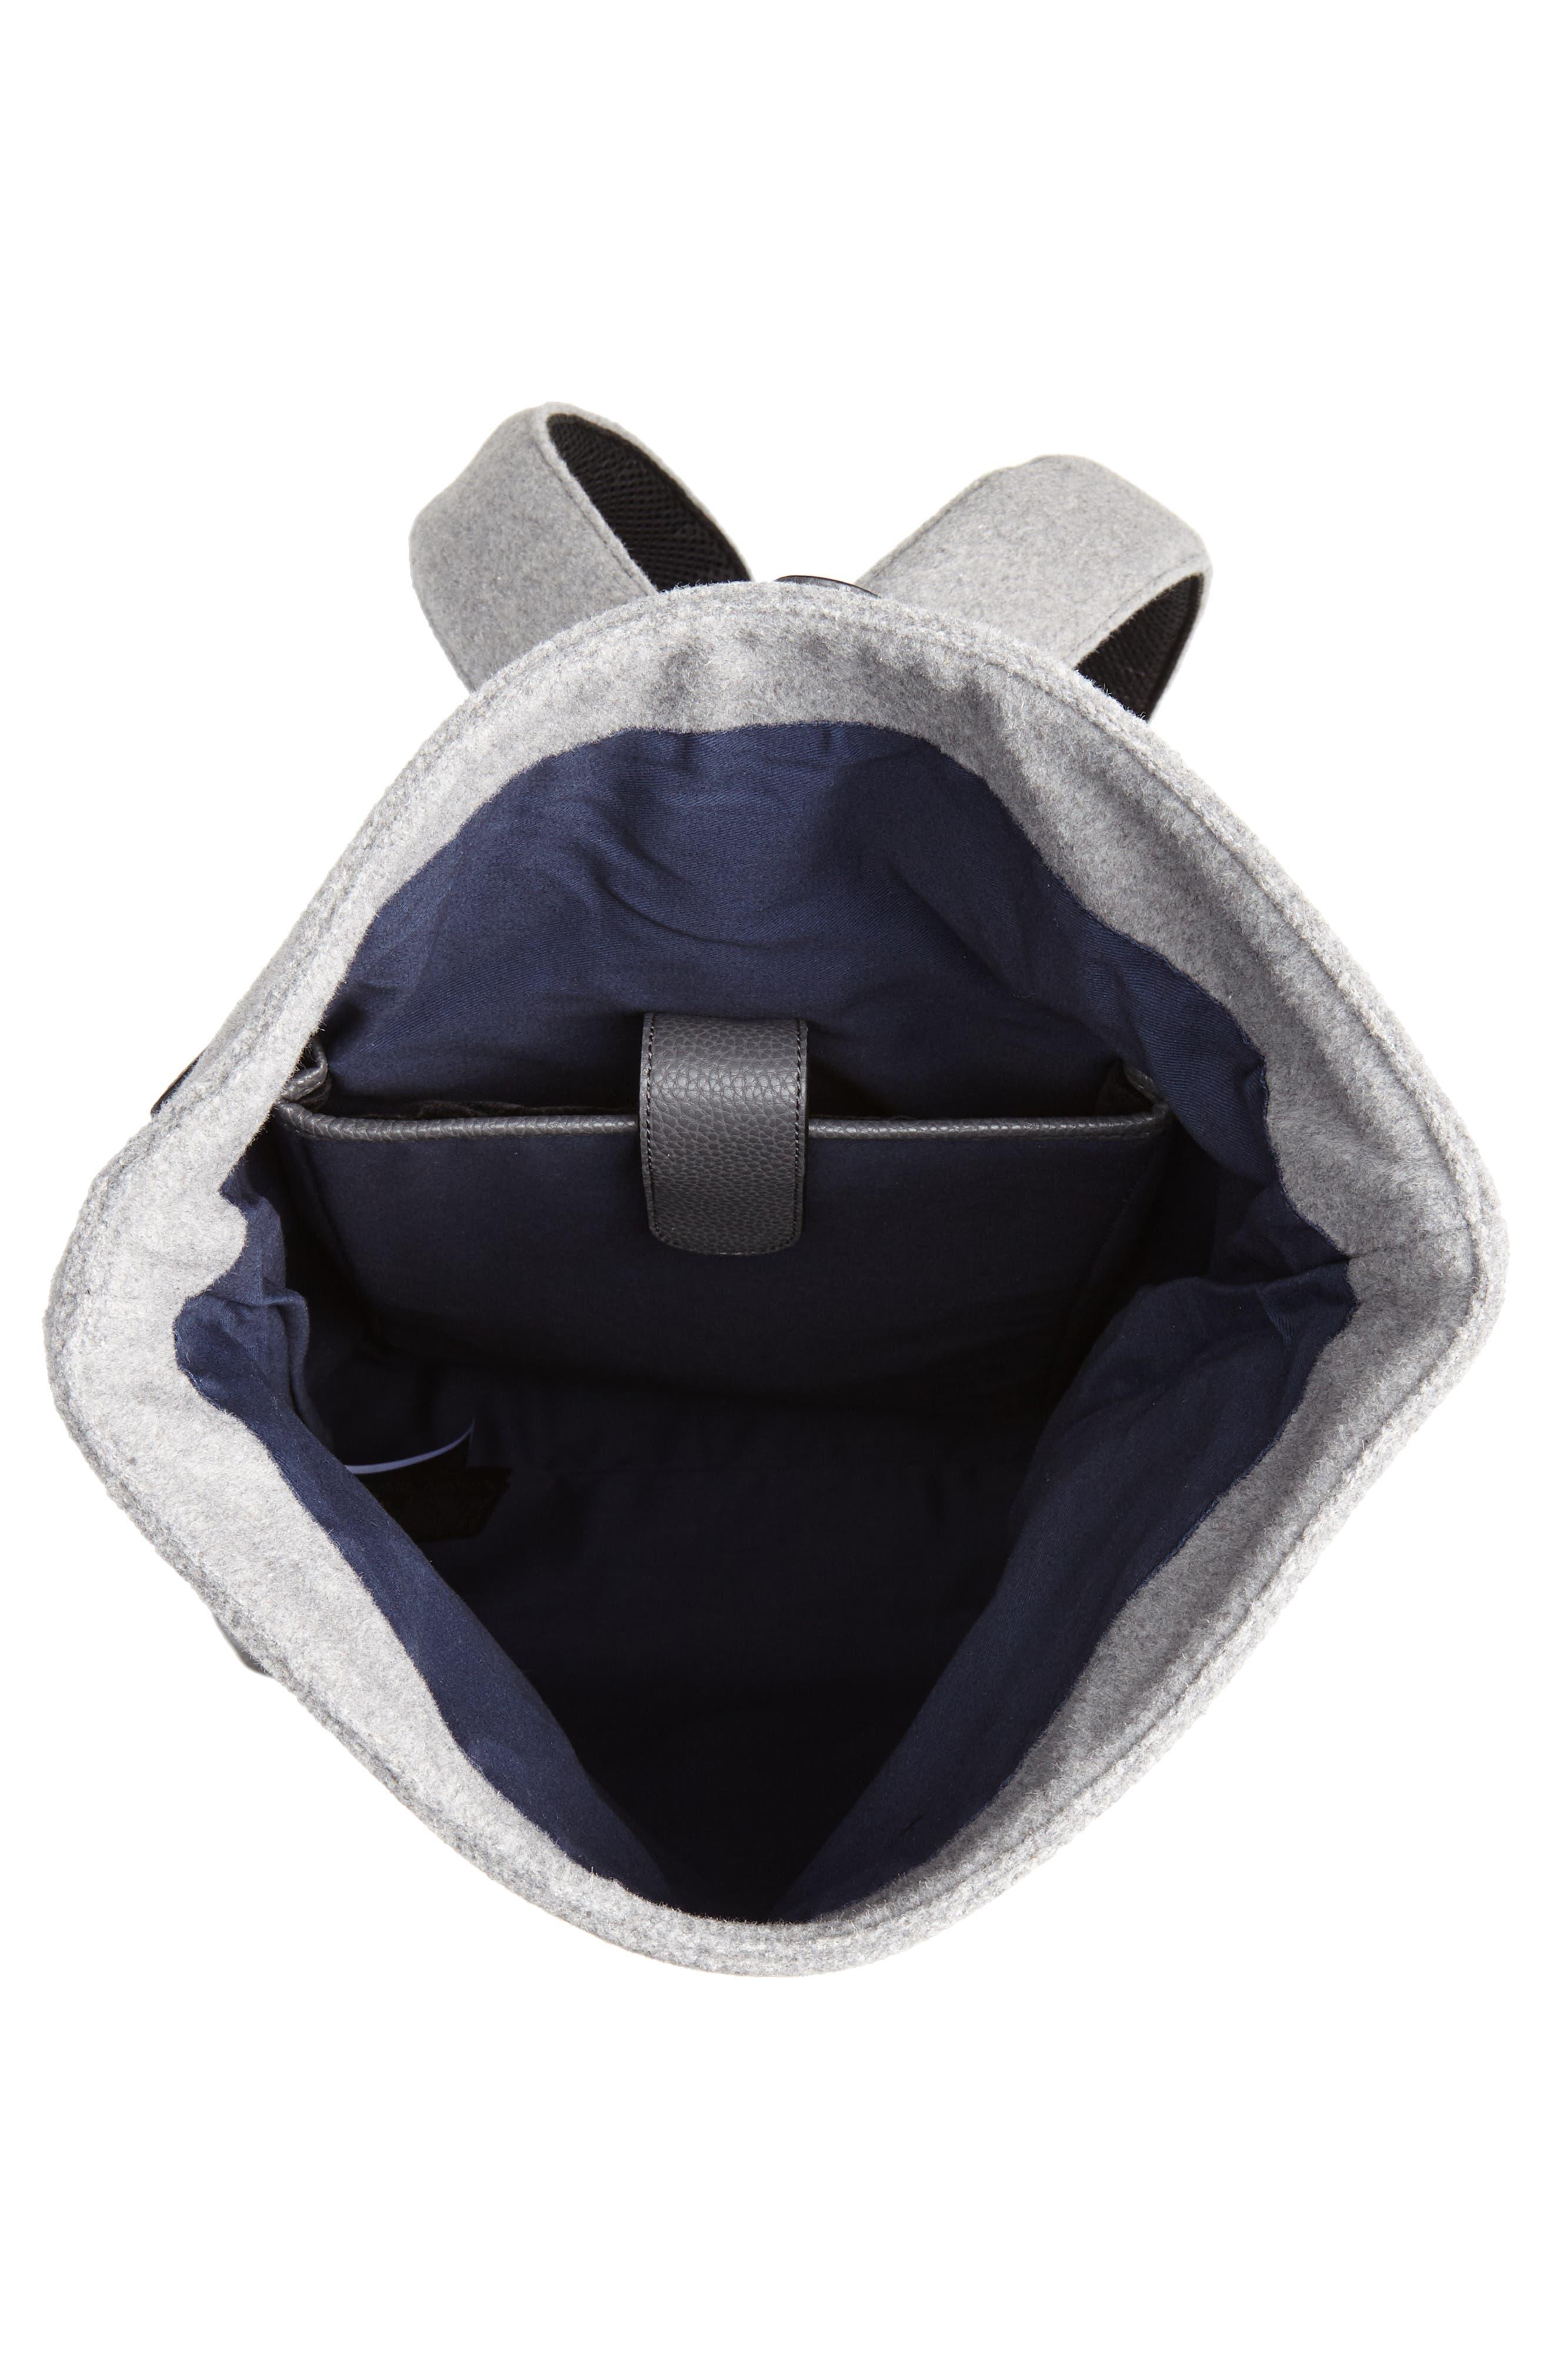 Cashed Backpack,                             Alternate thumbnail 4, color,                             GREY